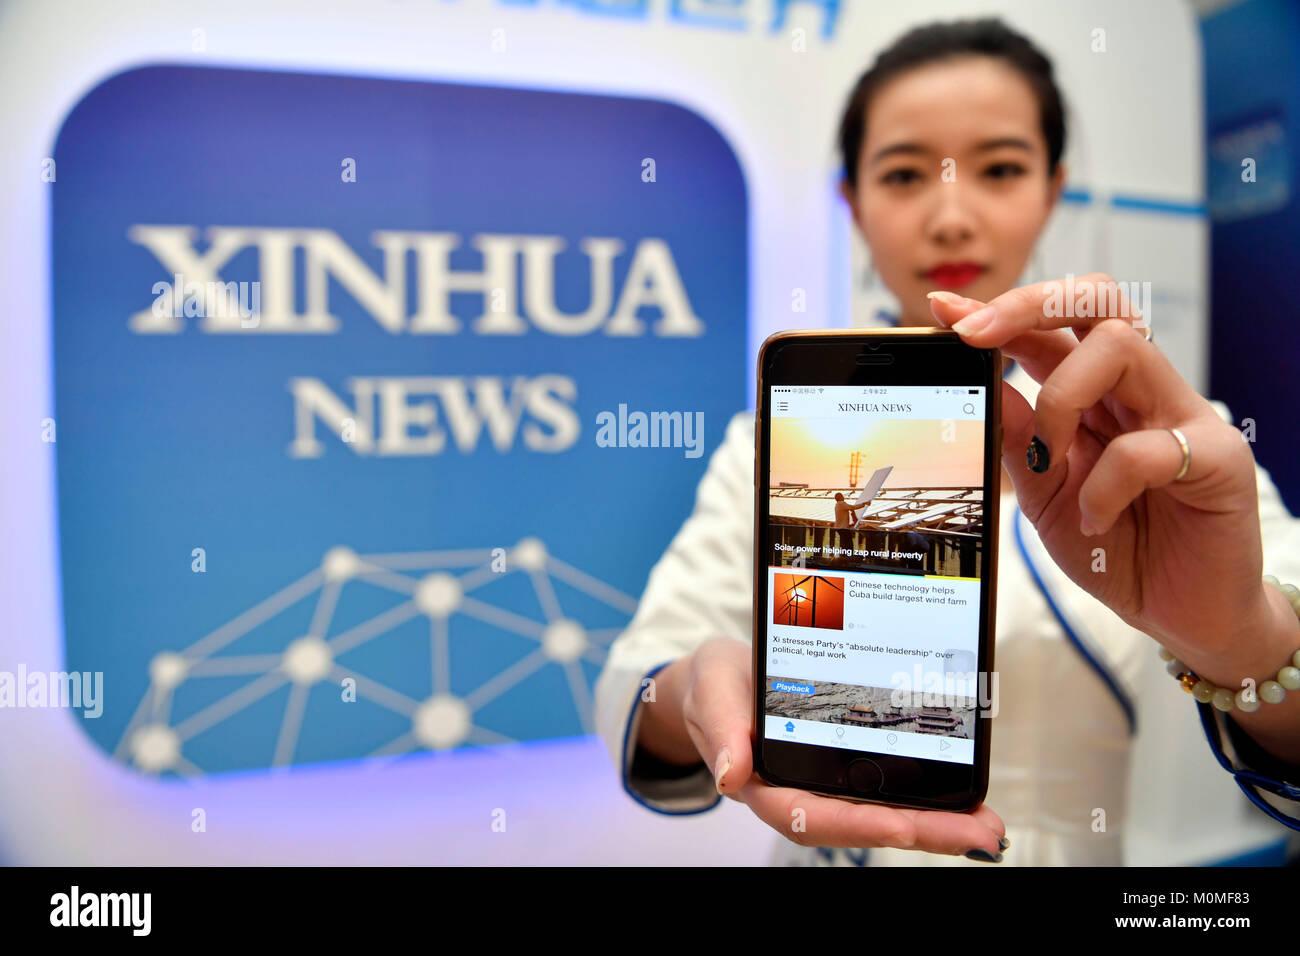 (180123) -- BEIJING, Jan. 23, 2018 (Xinhua) -- A staff member shows the Xinhua News App, in Beijing, capital of Stock Photo